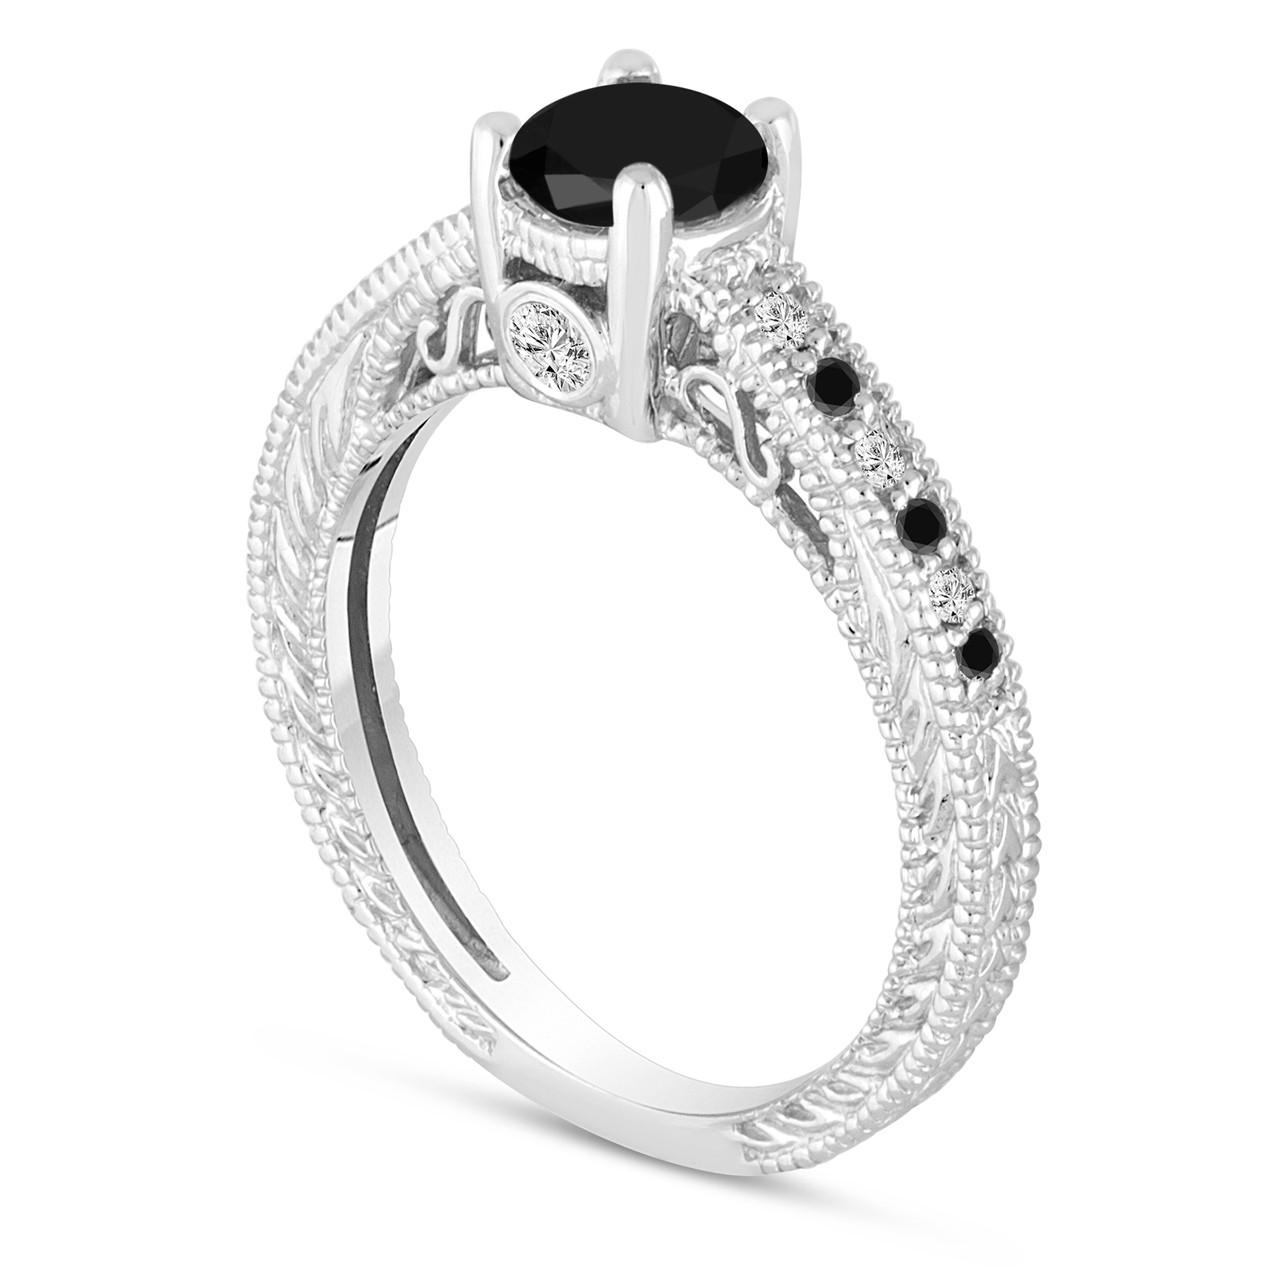 Natural Black Diamond Engagement Ring 14K White Gold